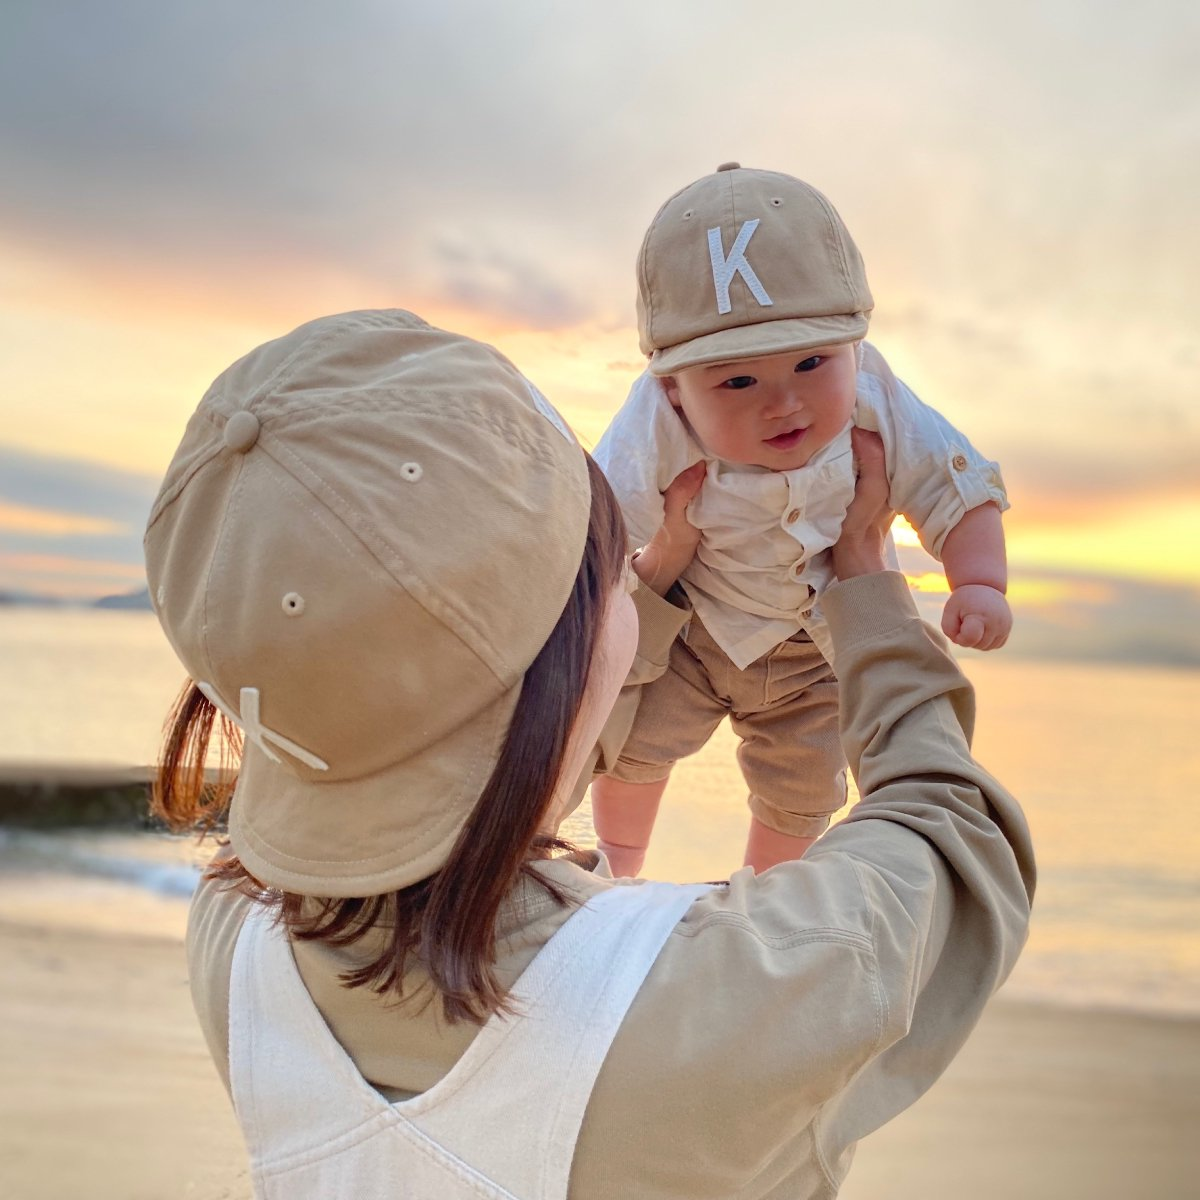 【BABY】Baby Sim Logo Cap 詳細画像25